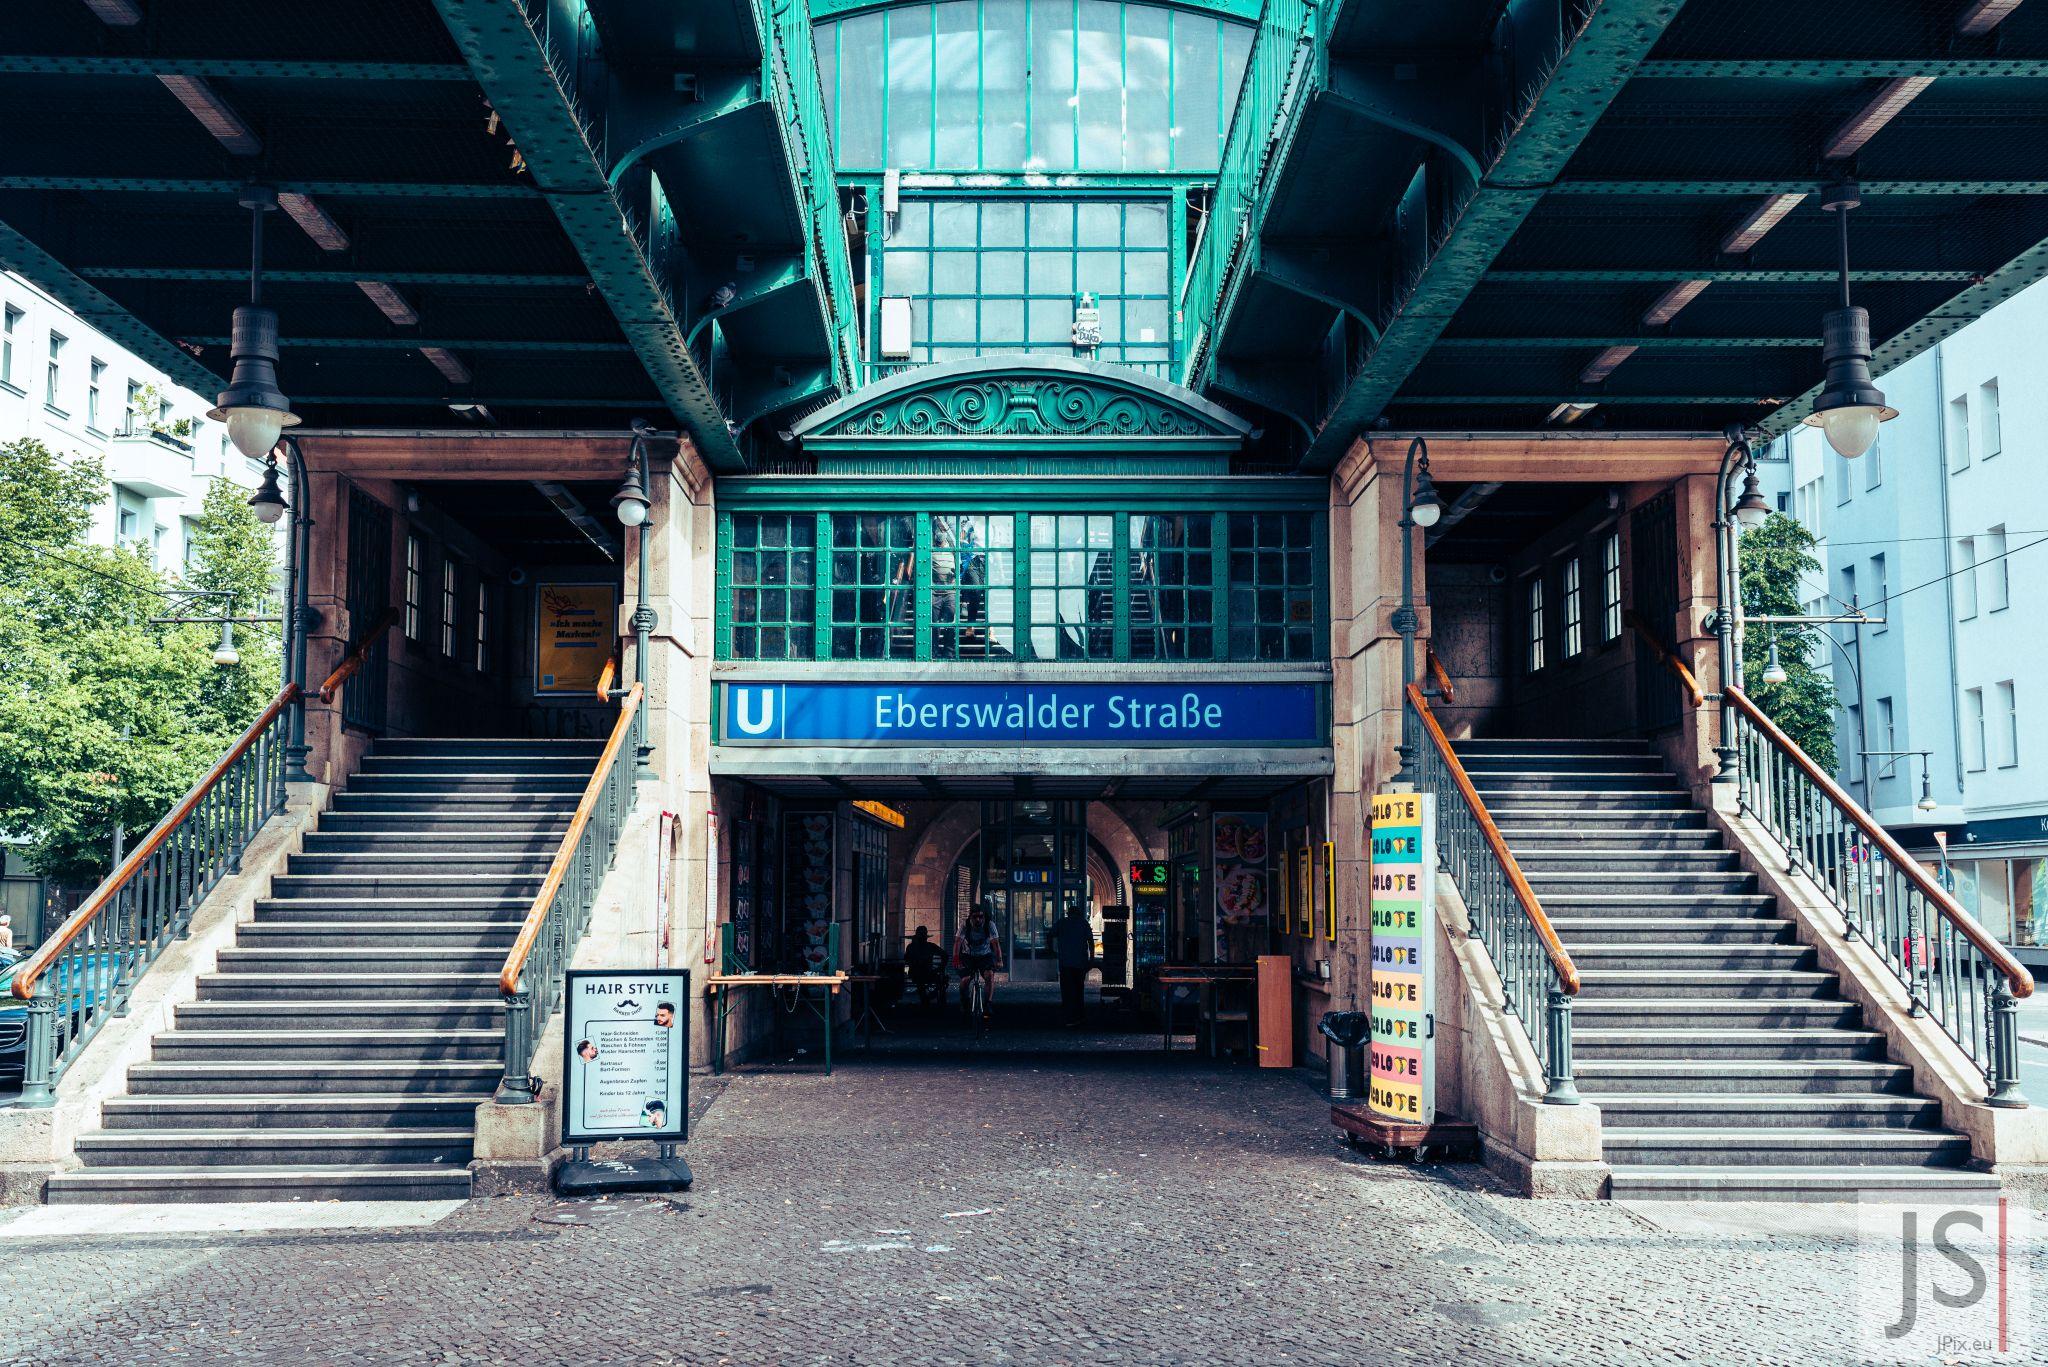 Station Eberswalder Straße, Germany